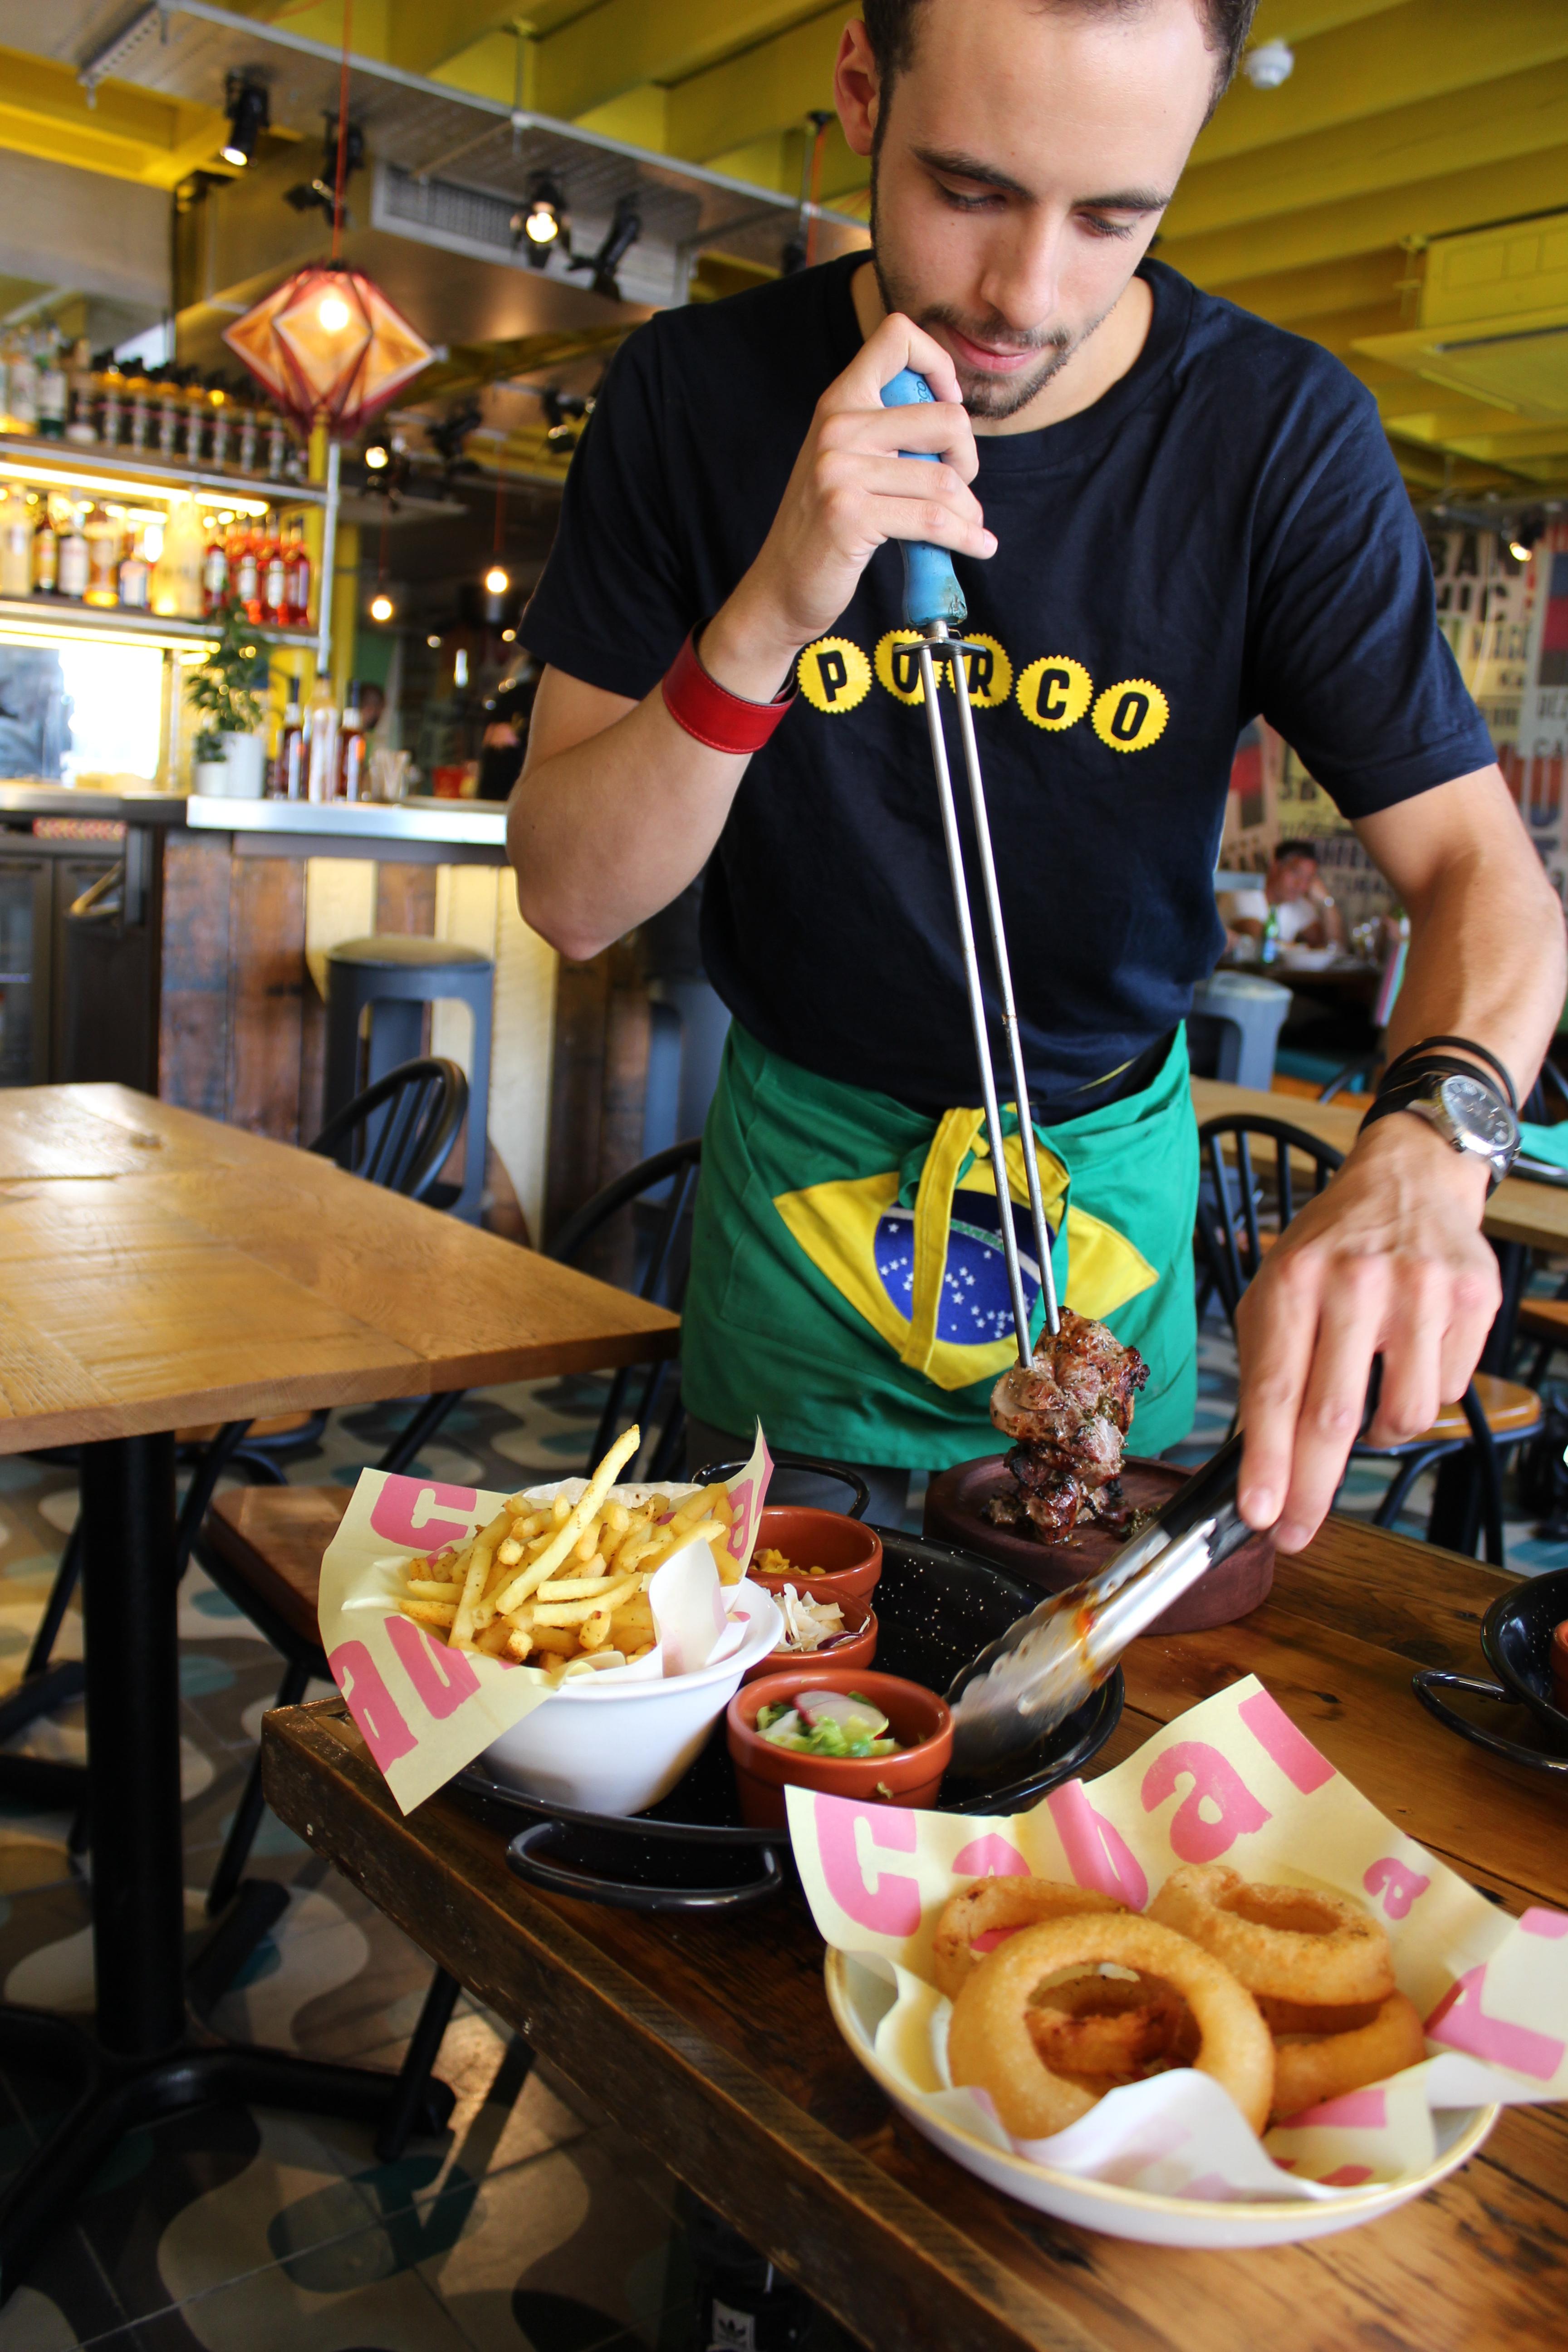 Cabana serving